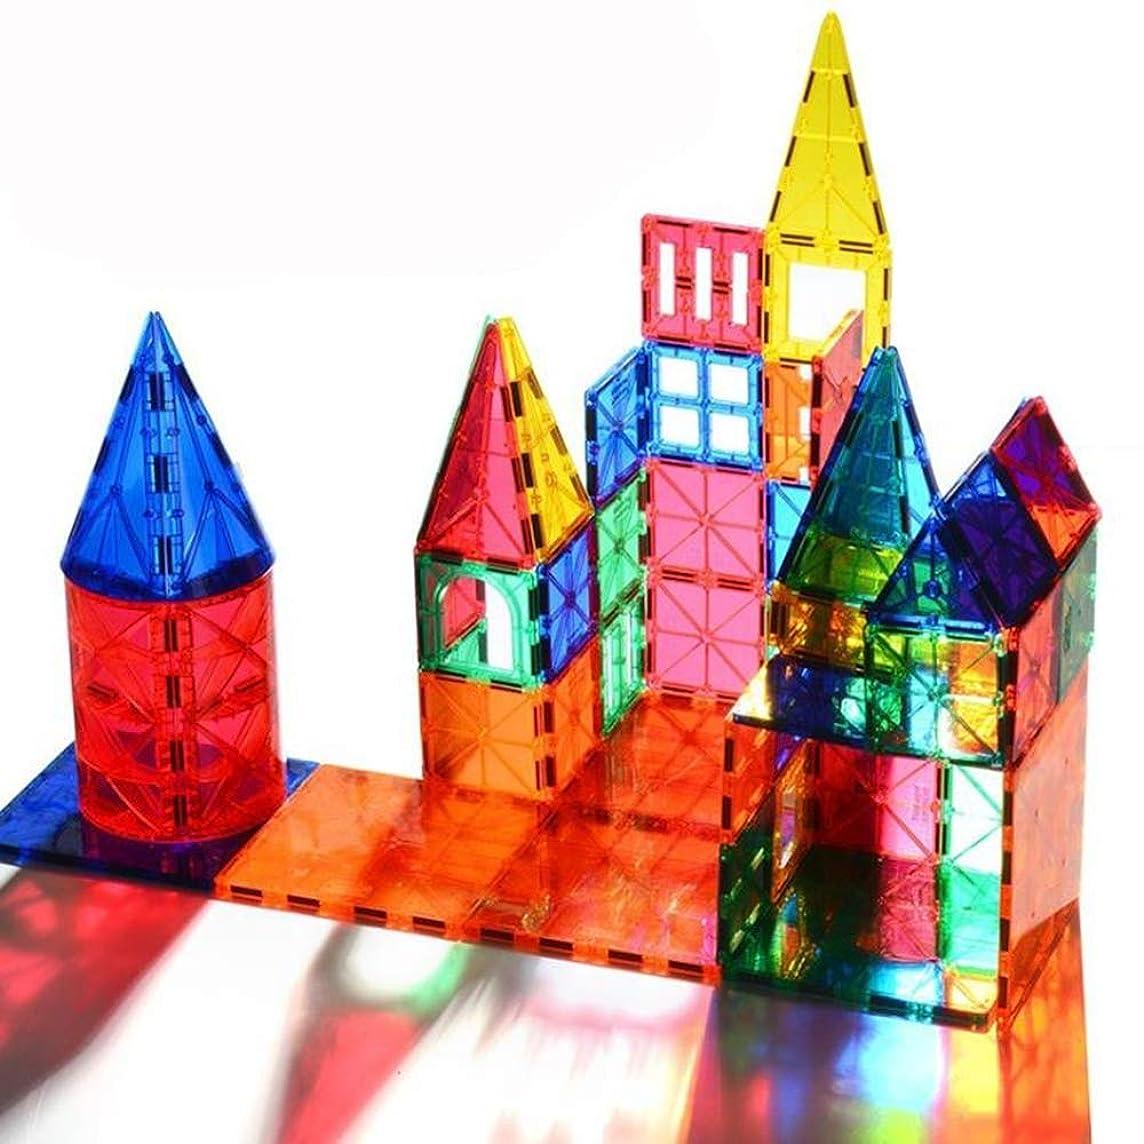 WXIAORONG Magnetic Tile Building Set, 32 Pcs Magnetic Building Blocks Set, Kids Magnetic Toys Construction Stacking Kits Creativity Educational, Children's DIY Toys